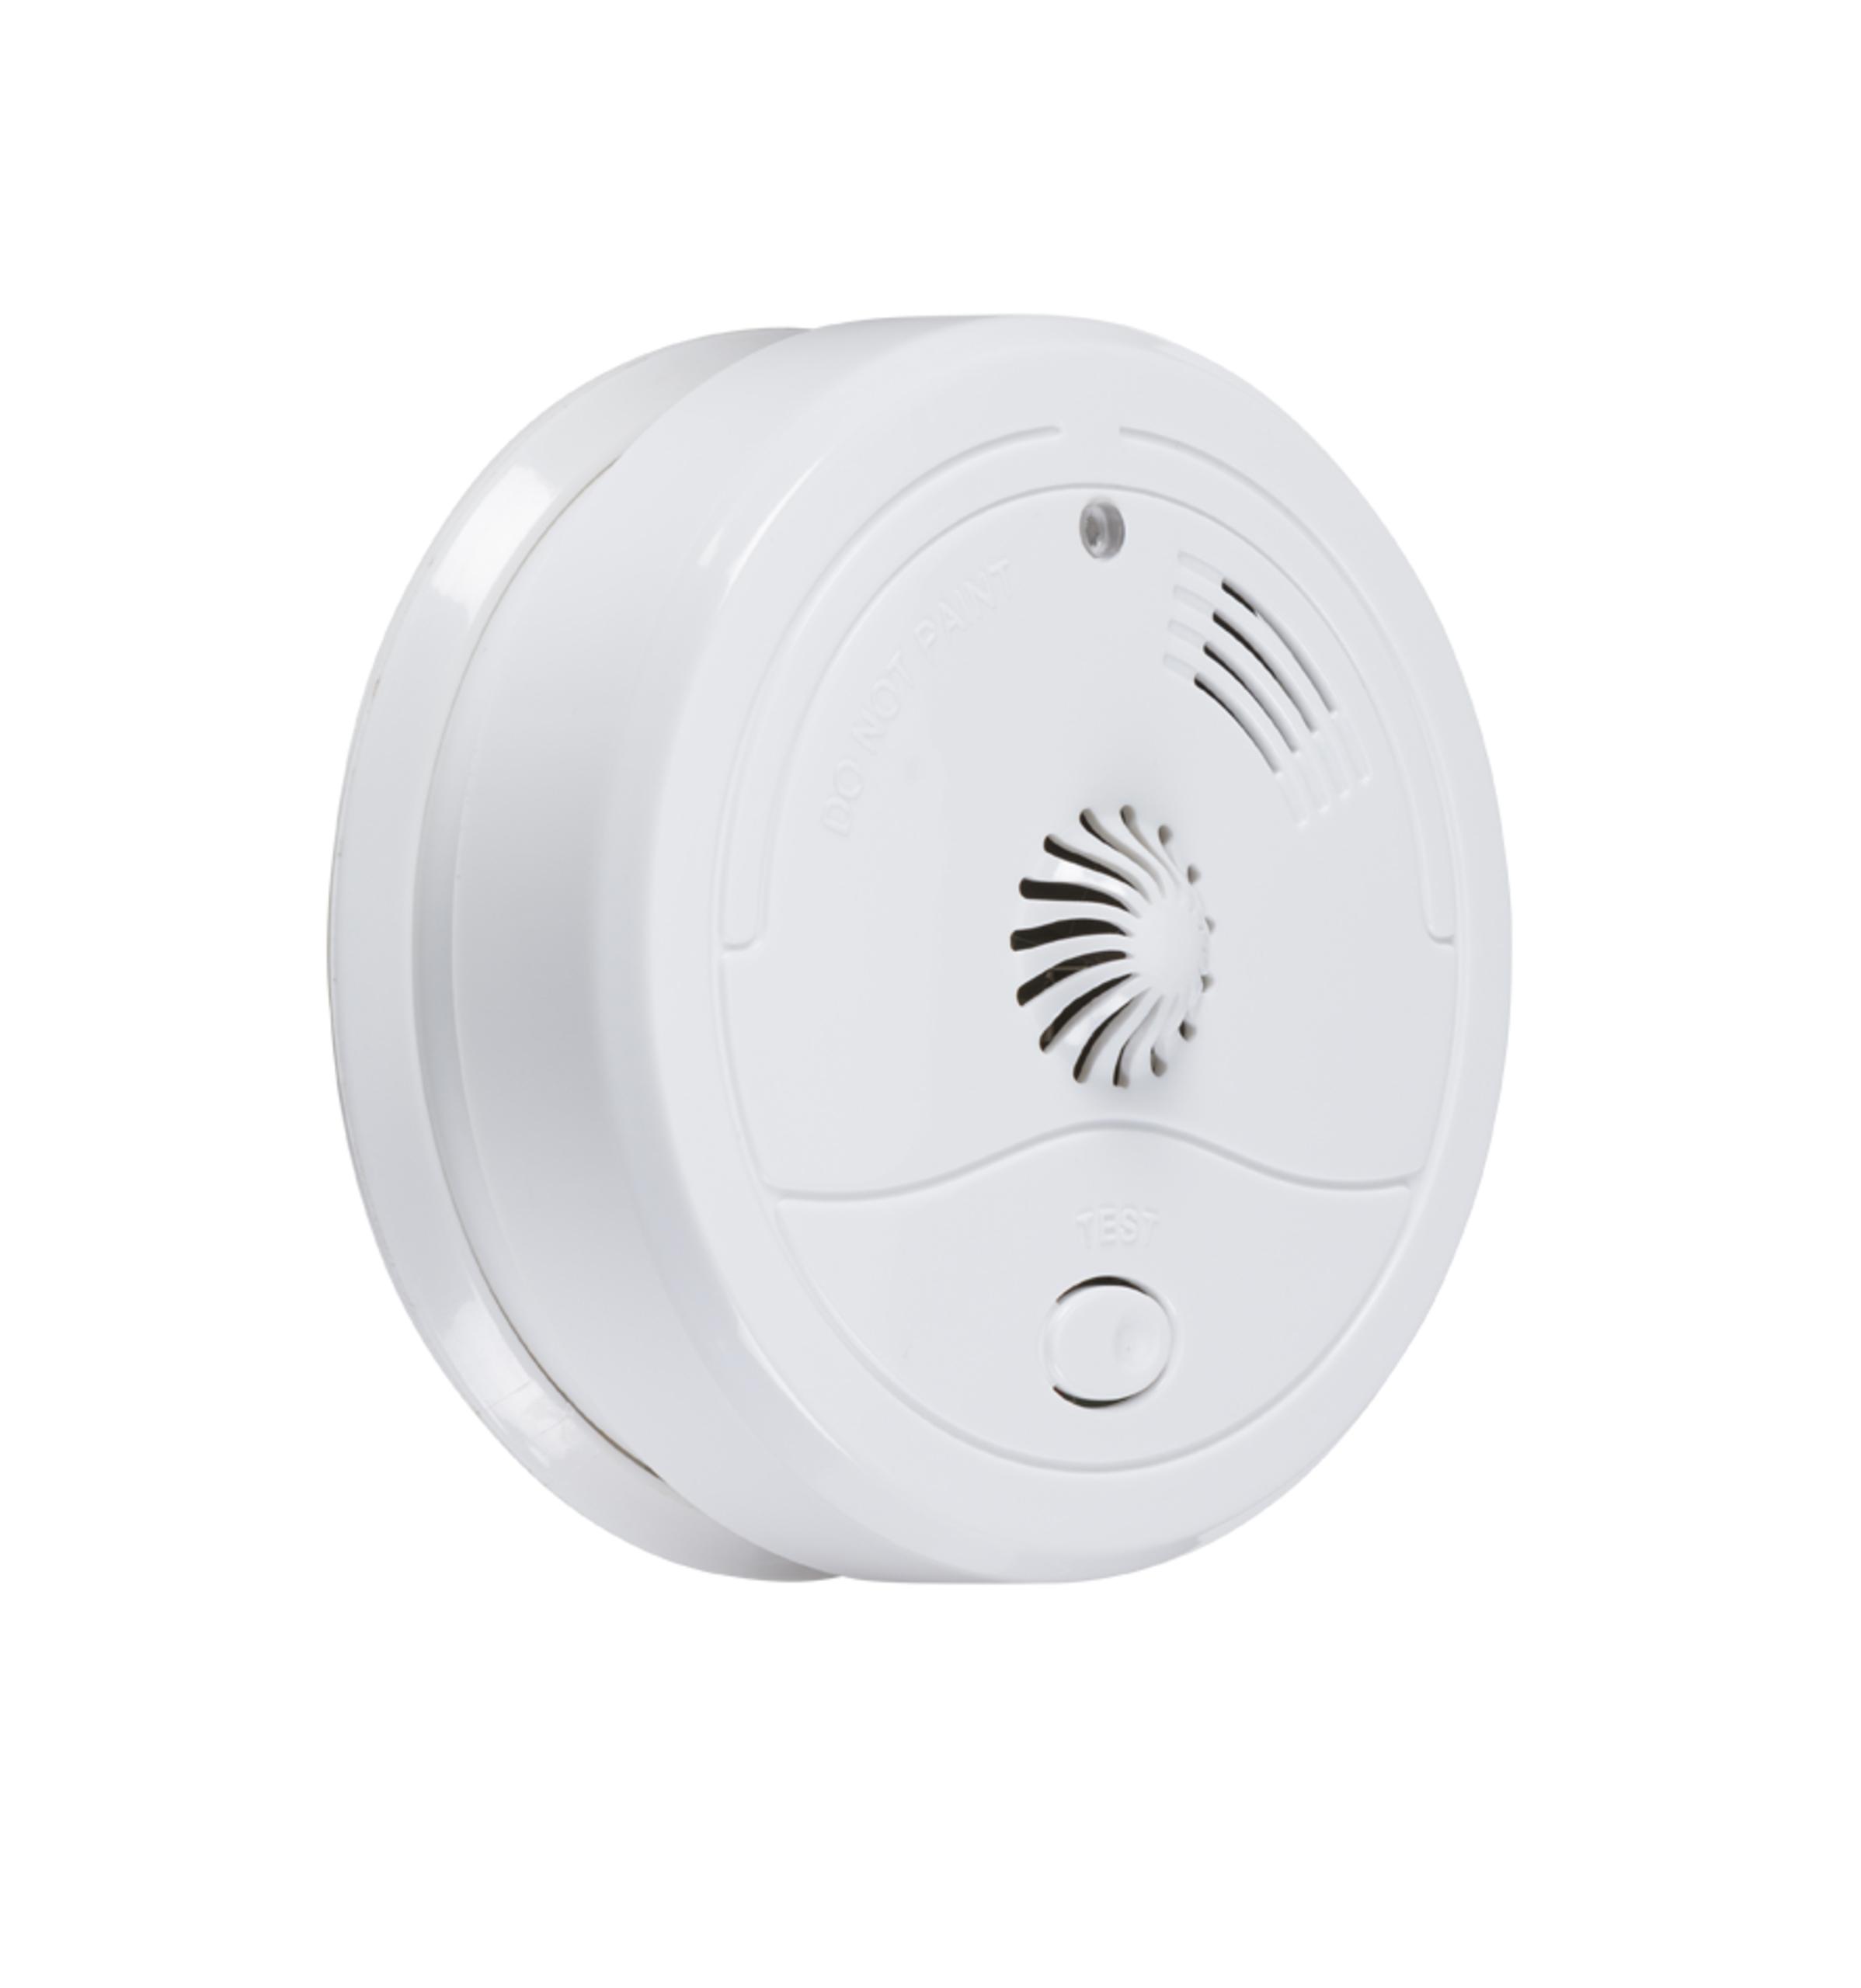 kitchen smoke detector cow knightsbridge extra loud heat alarm